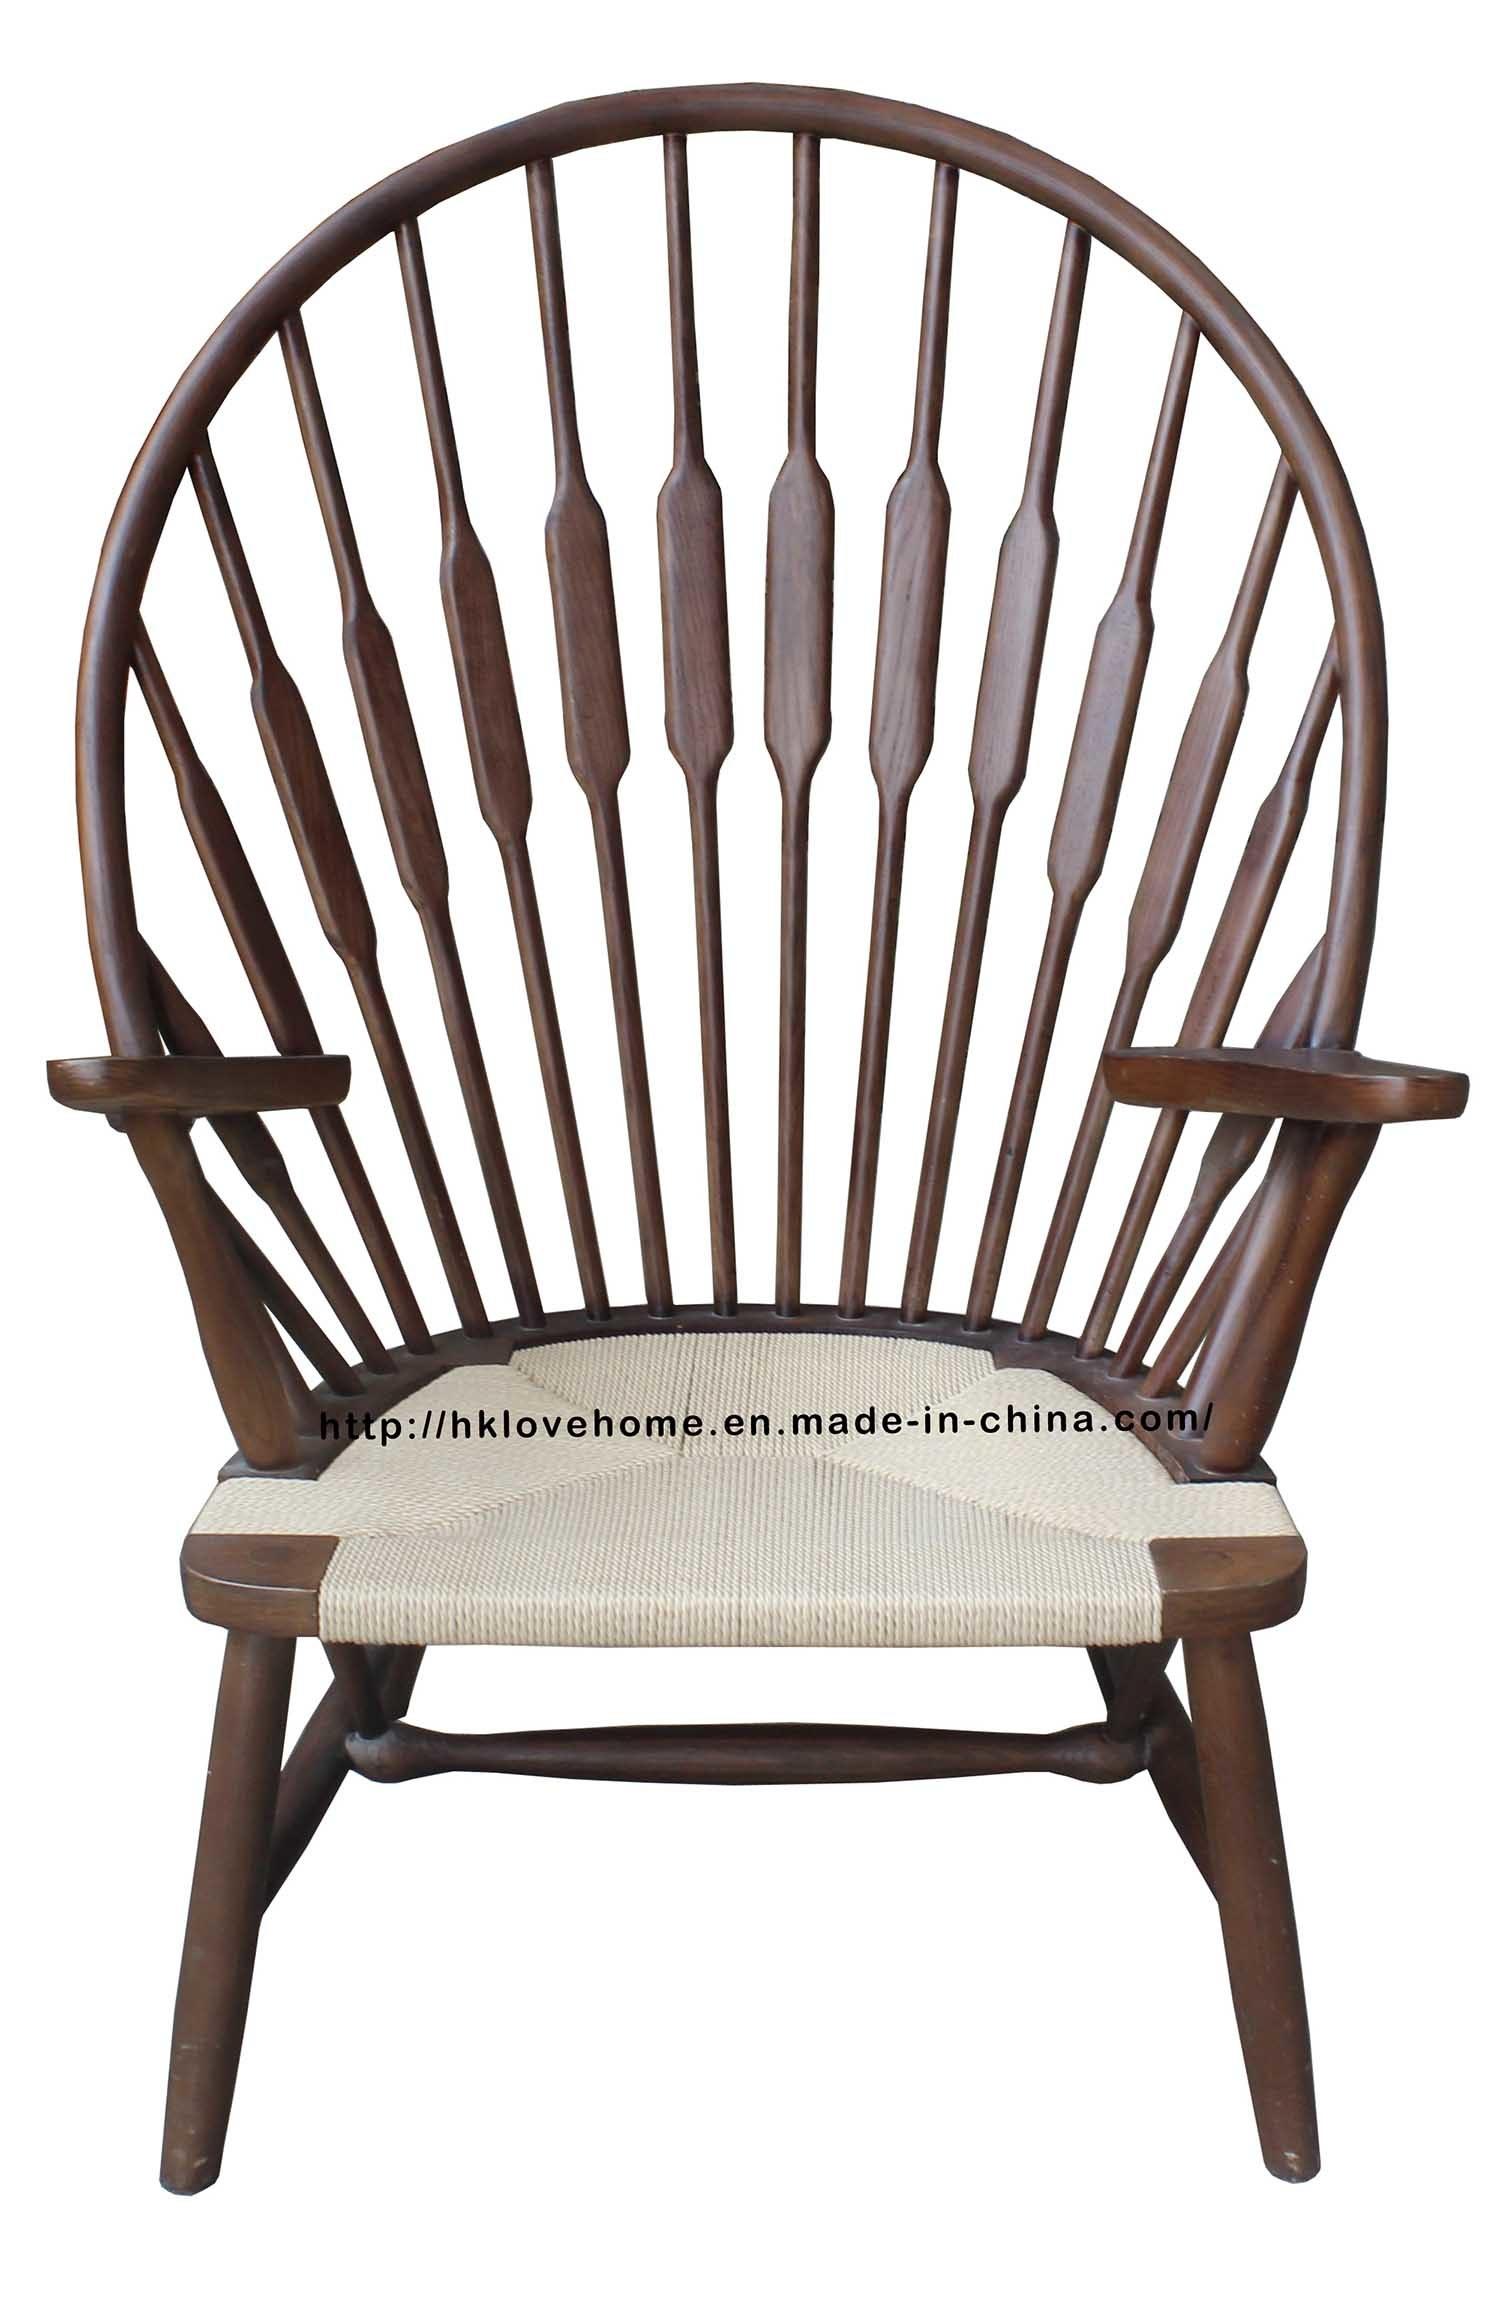 hans wegner peacock chair. China Replica Dining Coffee Hans Wegner Peacock Wooden Chair - Chair,